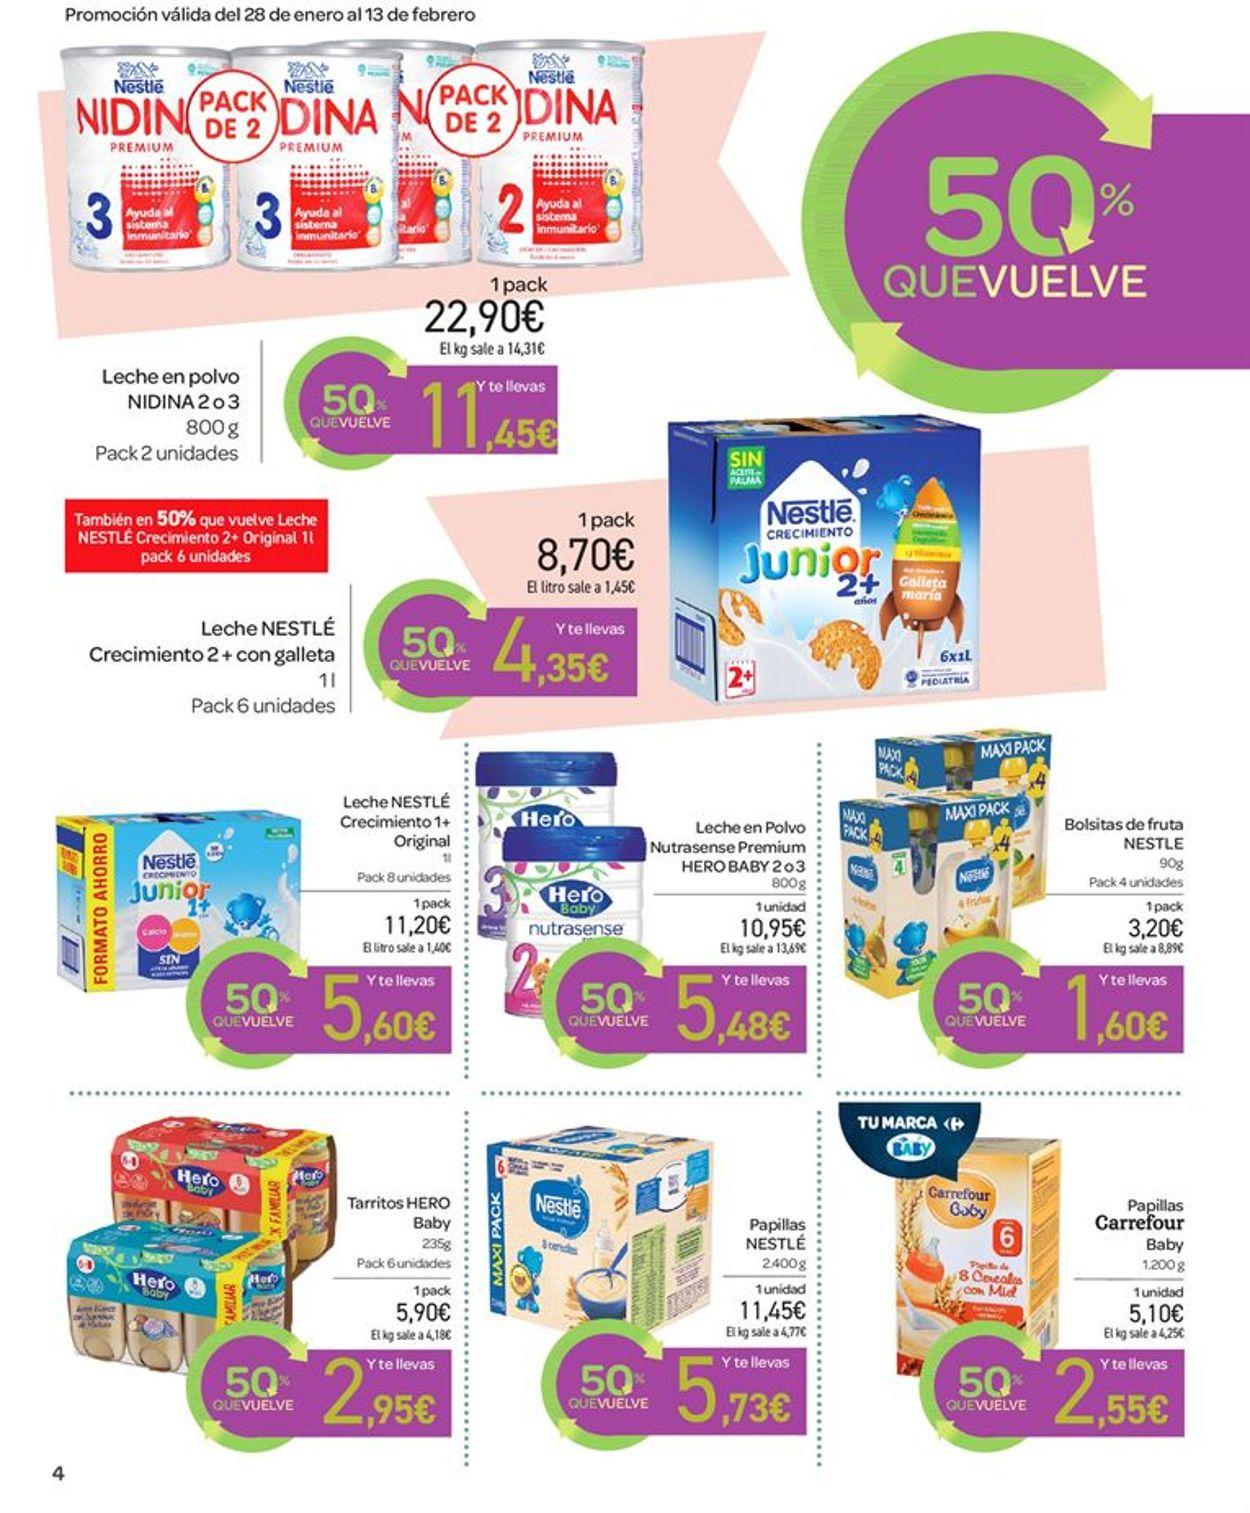 Carrefour Folleto - 29.01-28.02.2020 (Página 4)